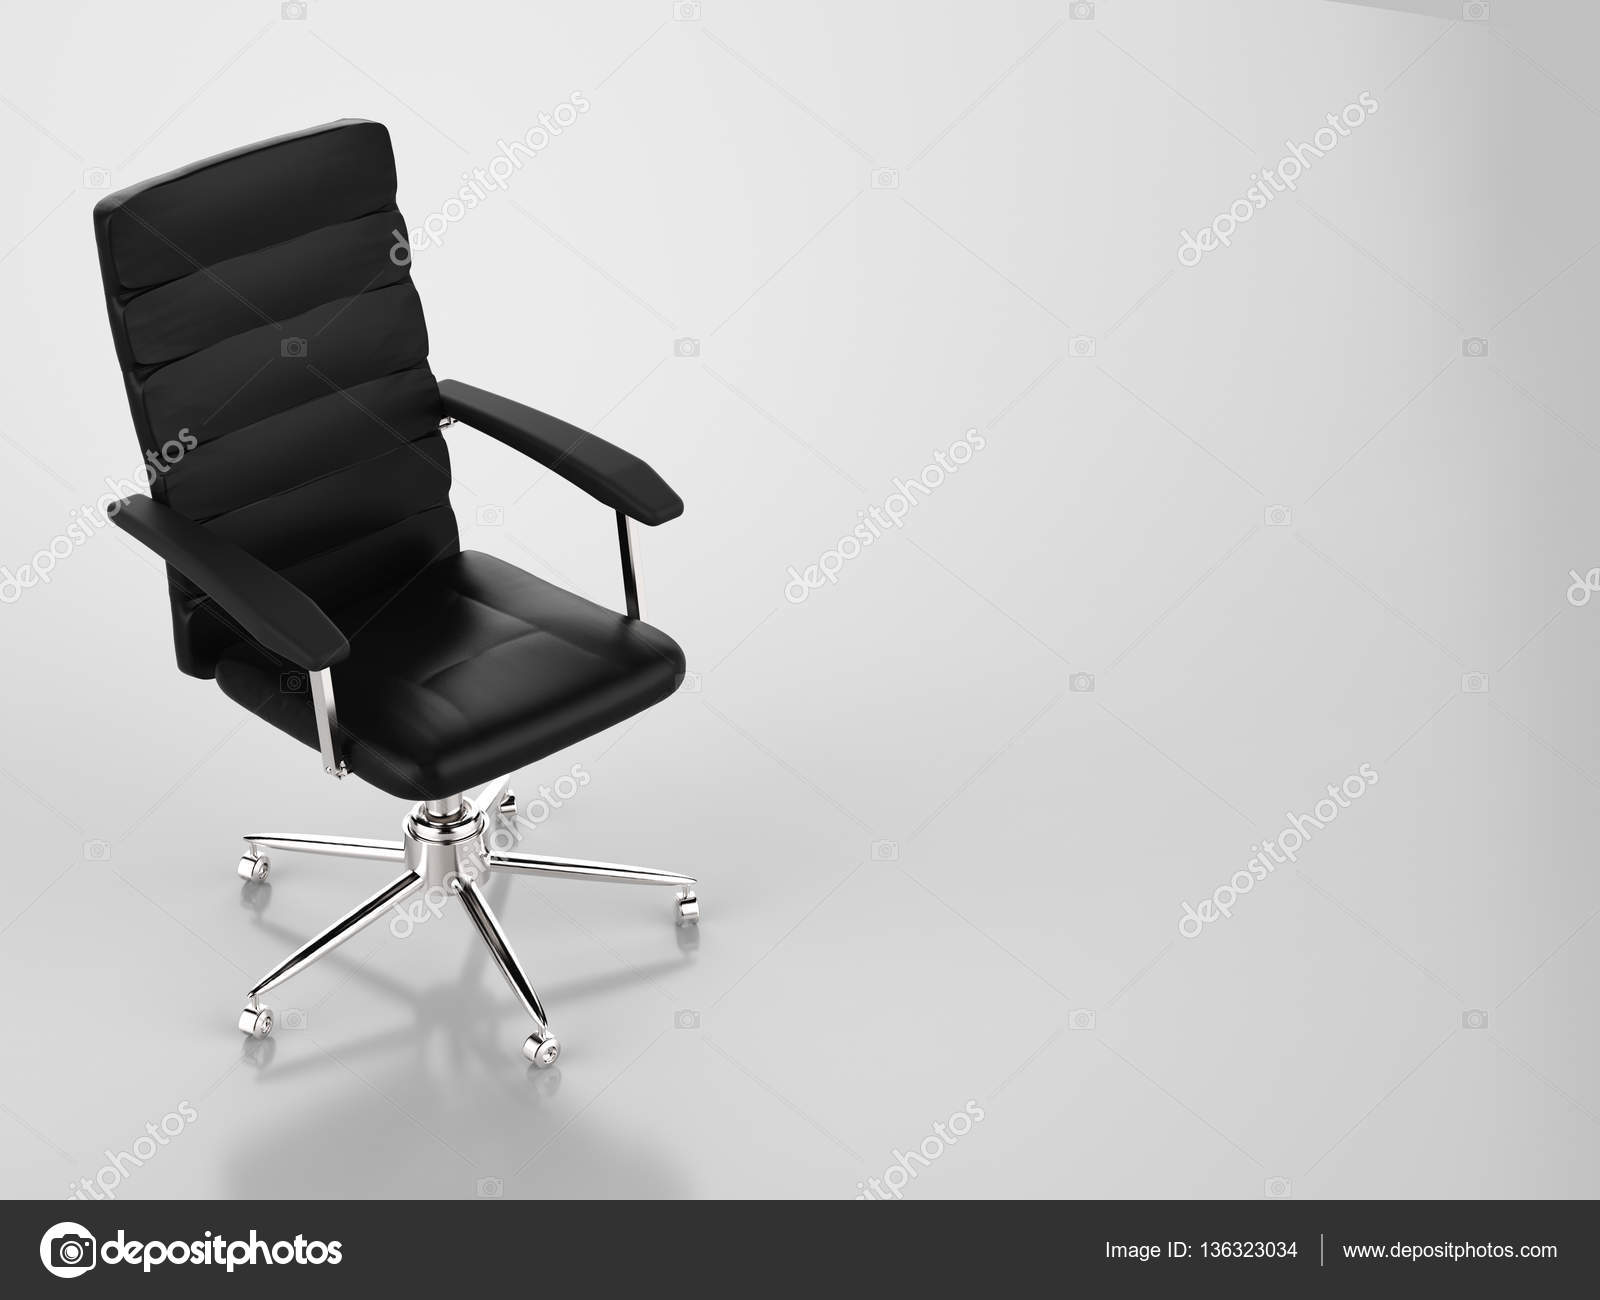 Sedie Da Ufficio In Pelle : Sedia da ufficio in pelle nera u foto stock phonlamai